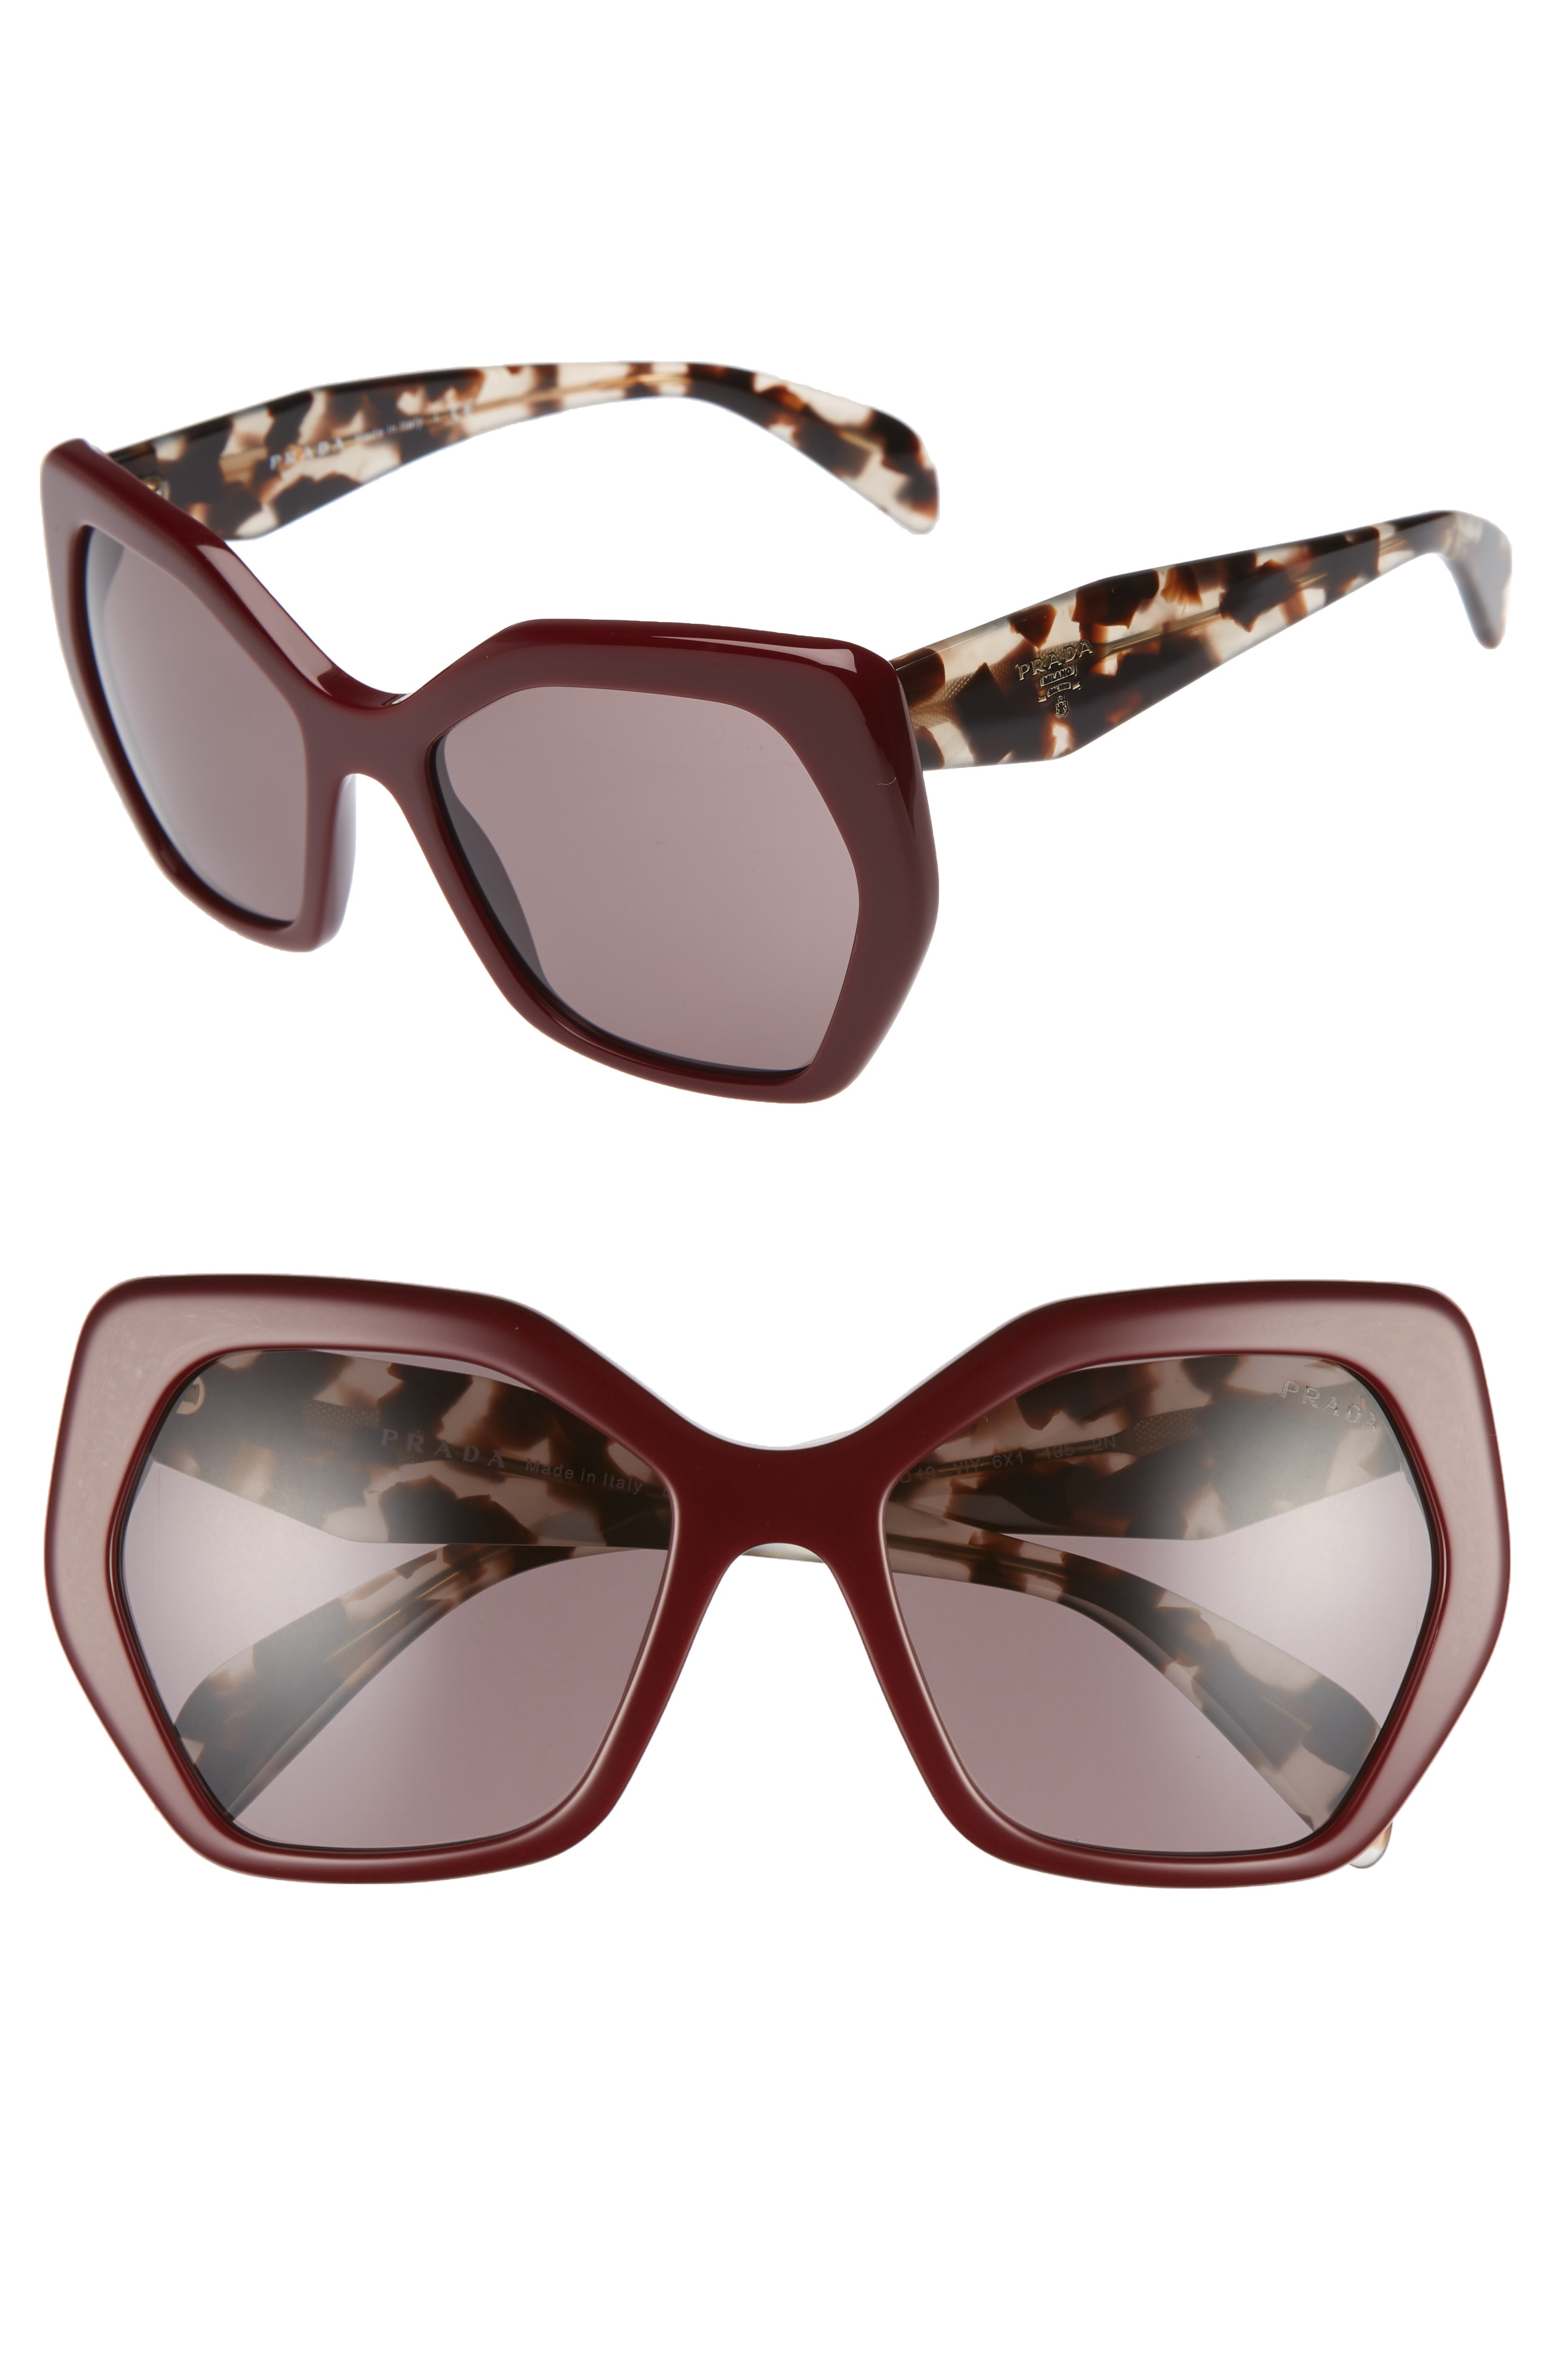 Prada Heritage 56mm Sunglasses (Nordstrom Exclusive)